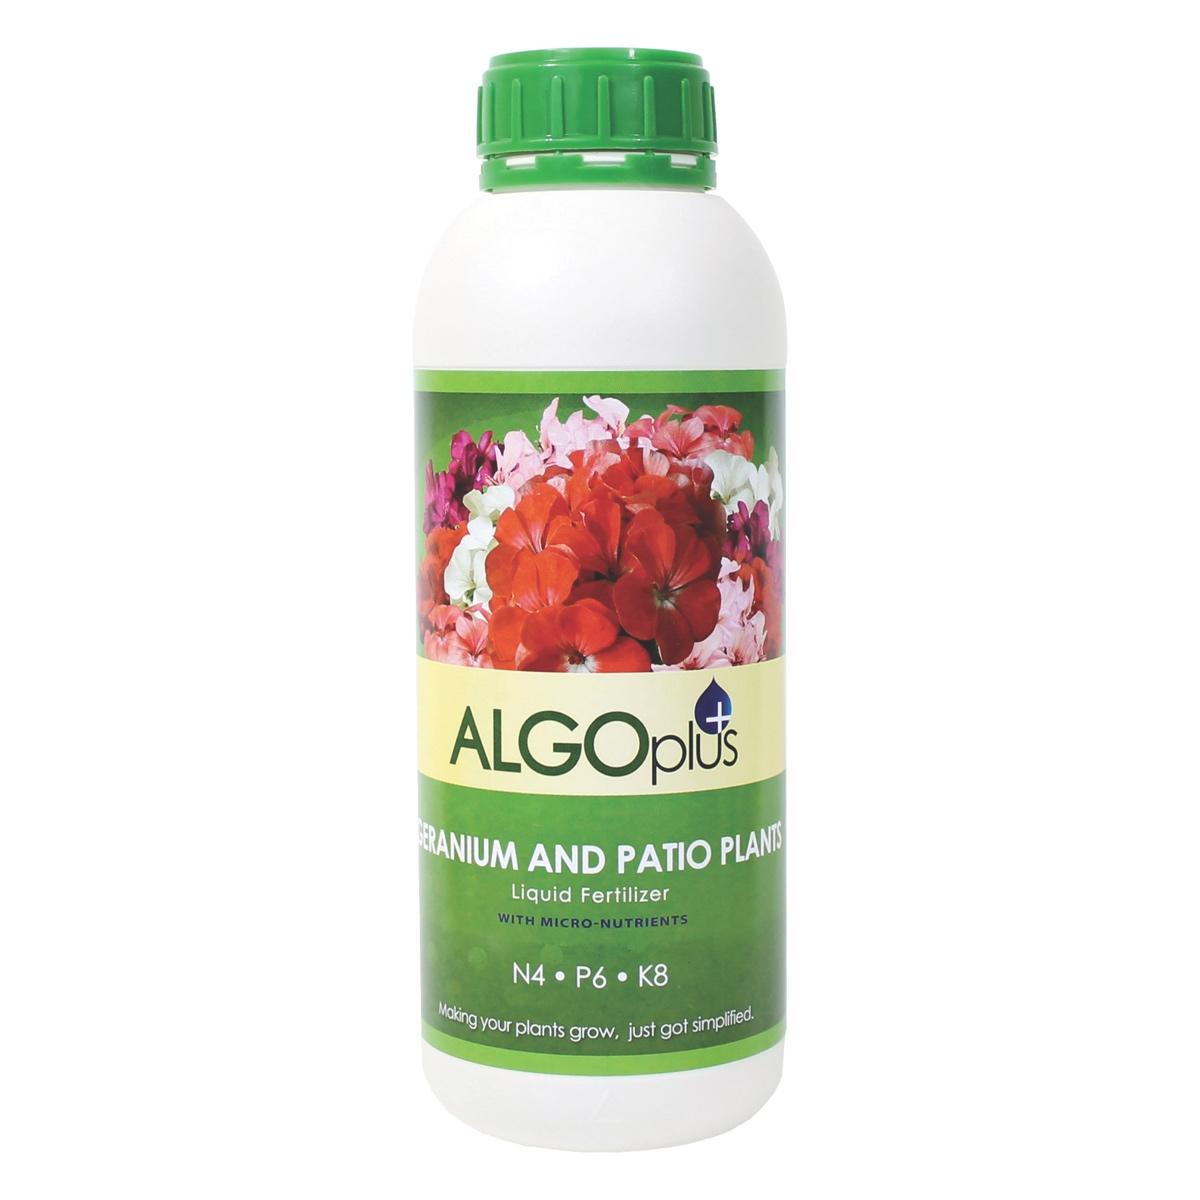 ALGOplus Geranium and Patio Plants